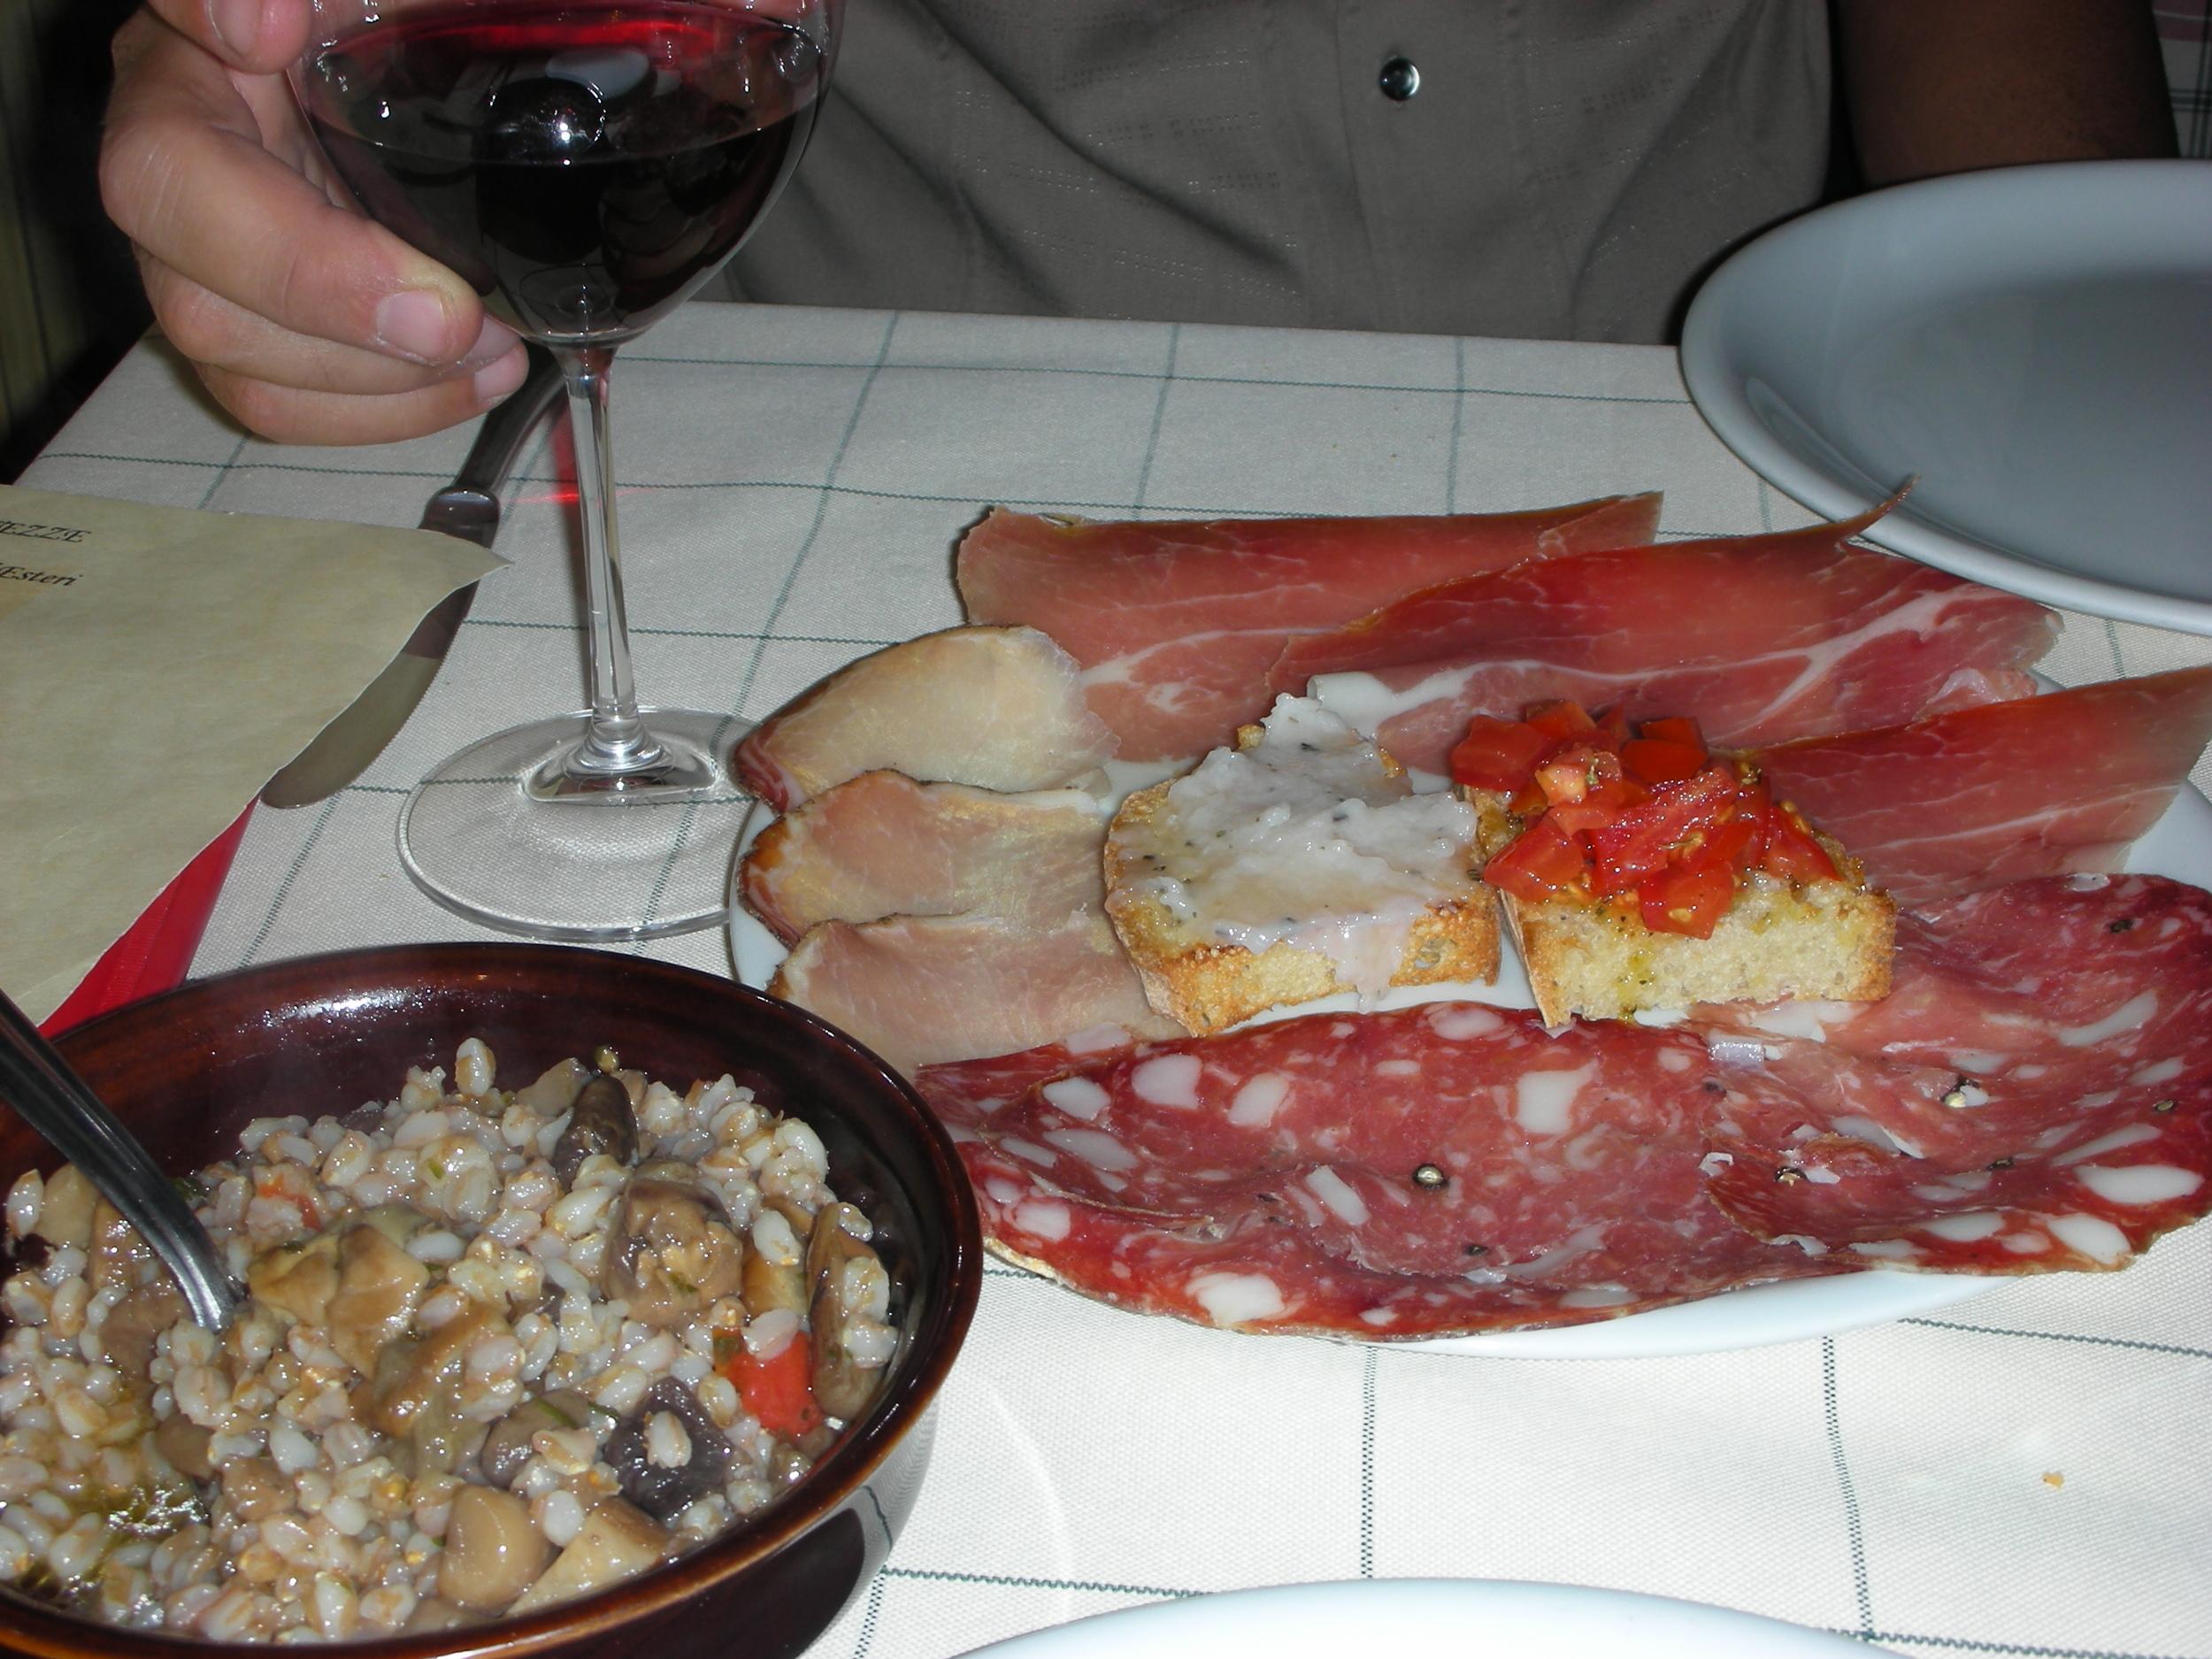 CRO Italy web 2007 - 04.JPG